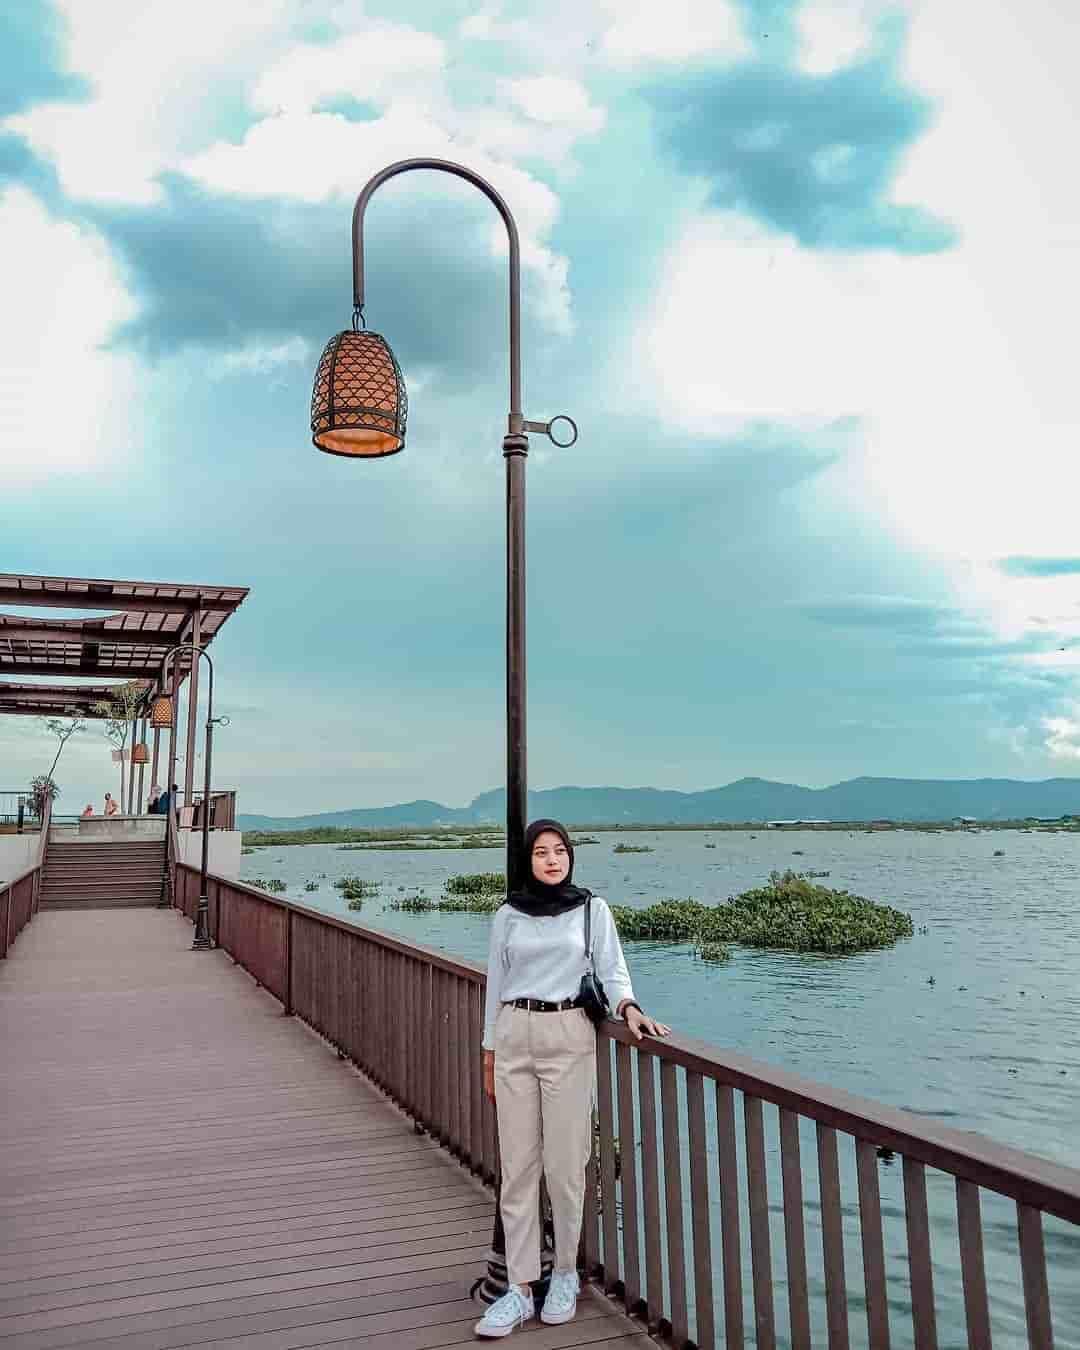 15 Tempat Wisata di Kabupaten Semarang Semarang atas, Jawa ...